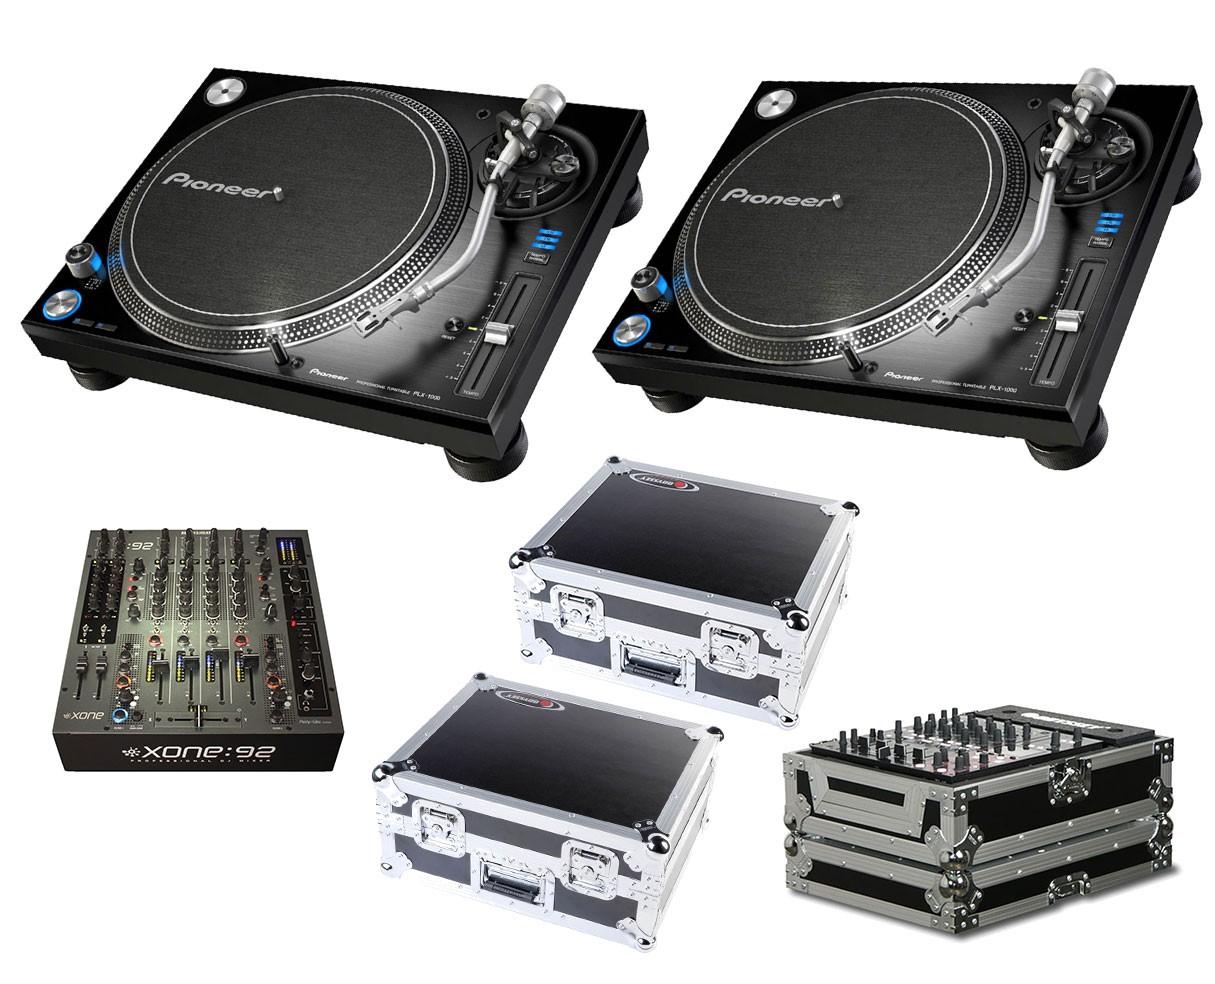 2x Pioneer PLX-1000 + Xone:92 Fader + Odyssey Cases